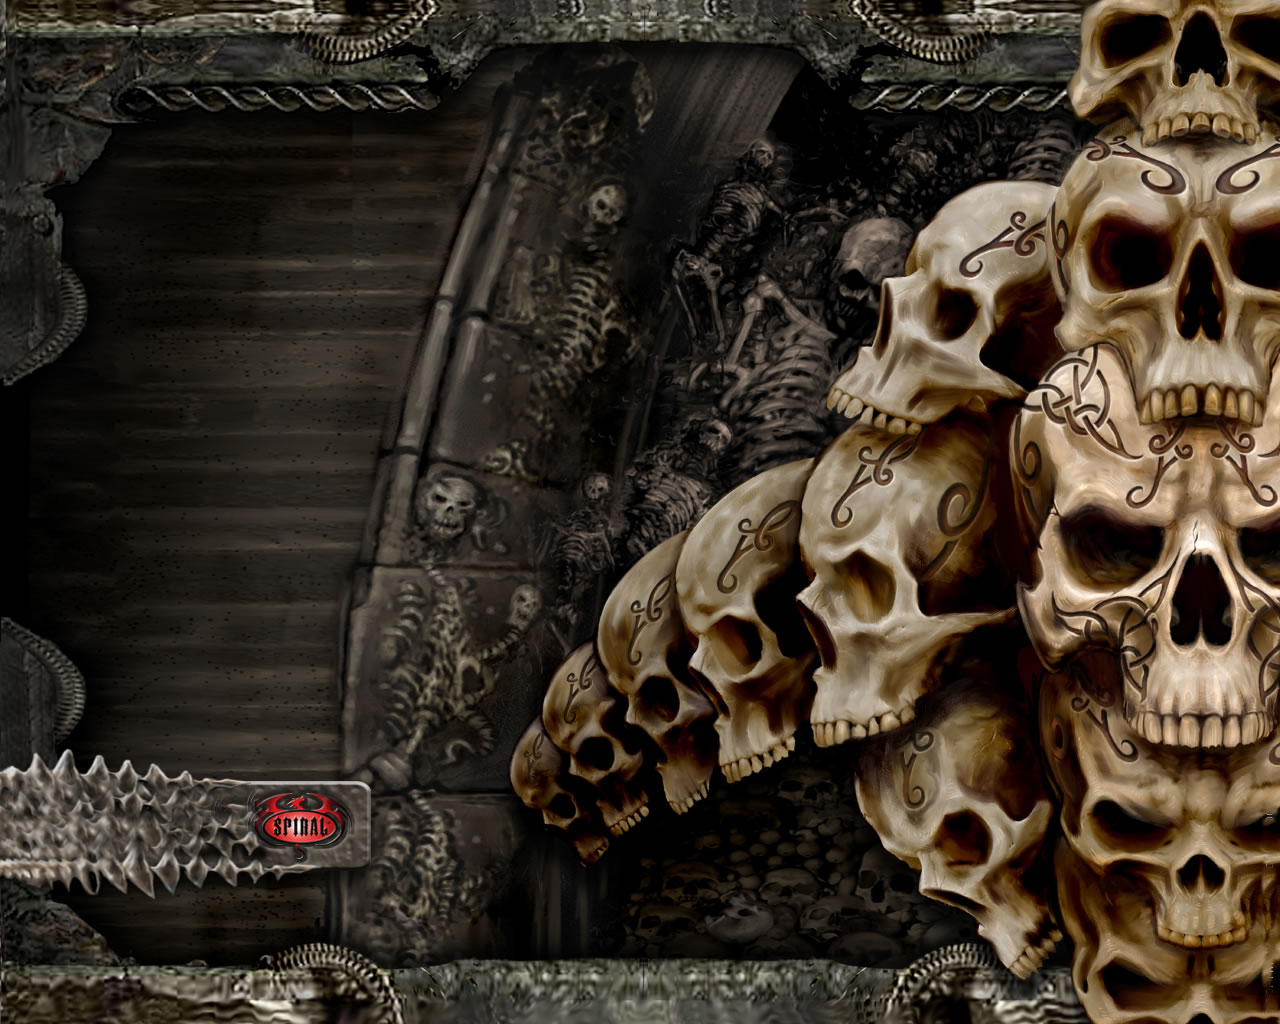 Fantastic   Wallpaper Home Screen Skull - ghost_evils_devils_dark_wallpapers+%252810%2529  You Should Have_742989.jpg